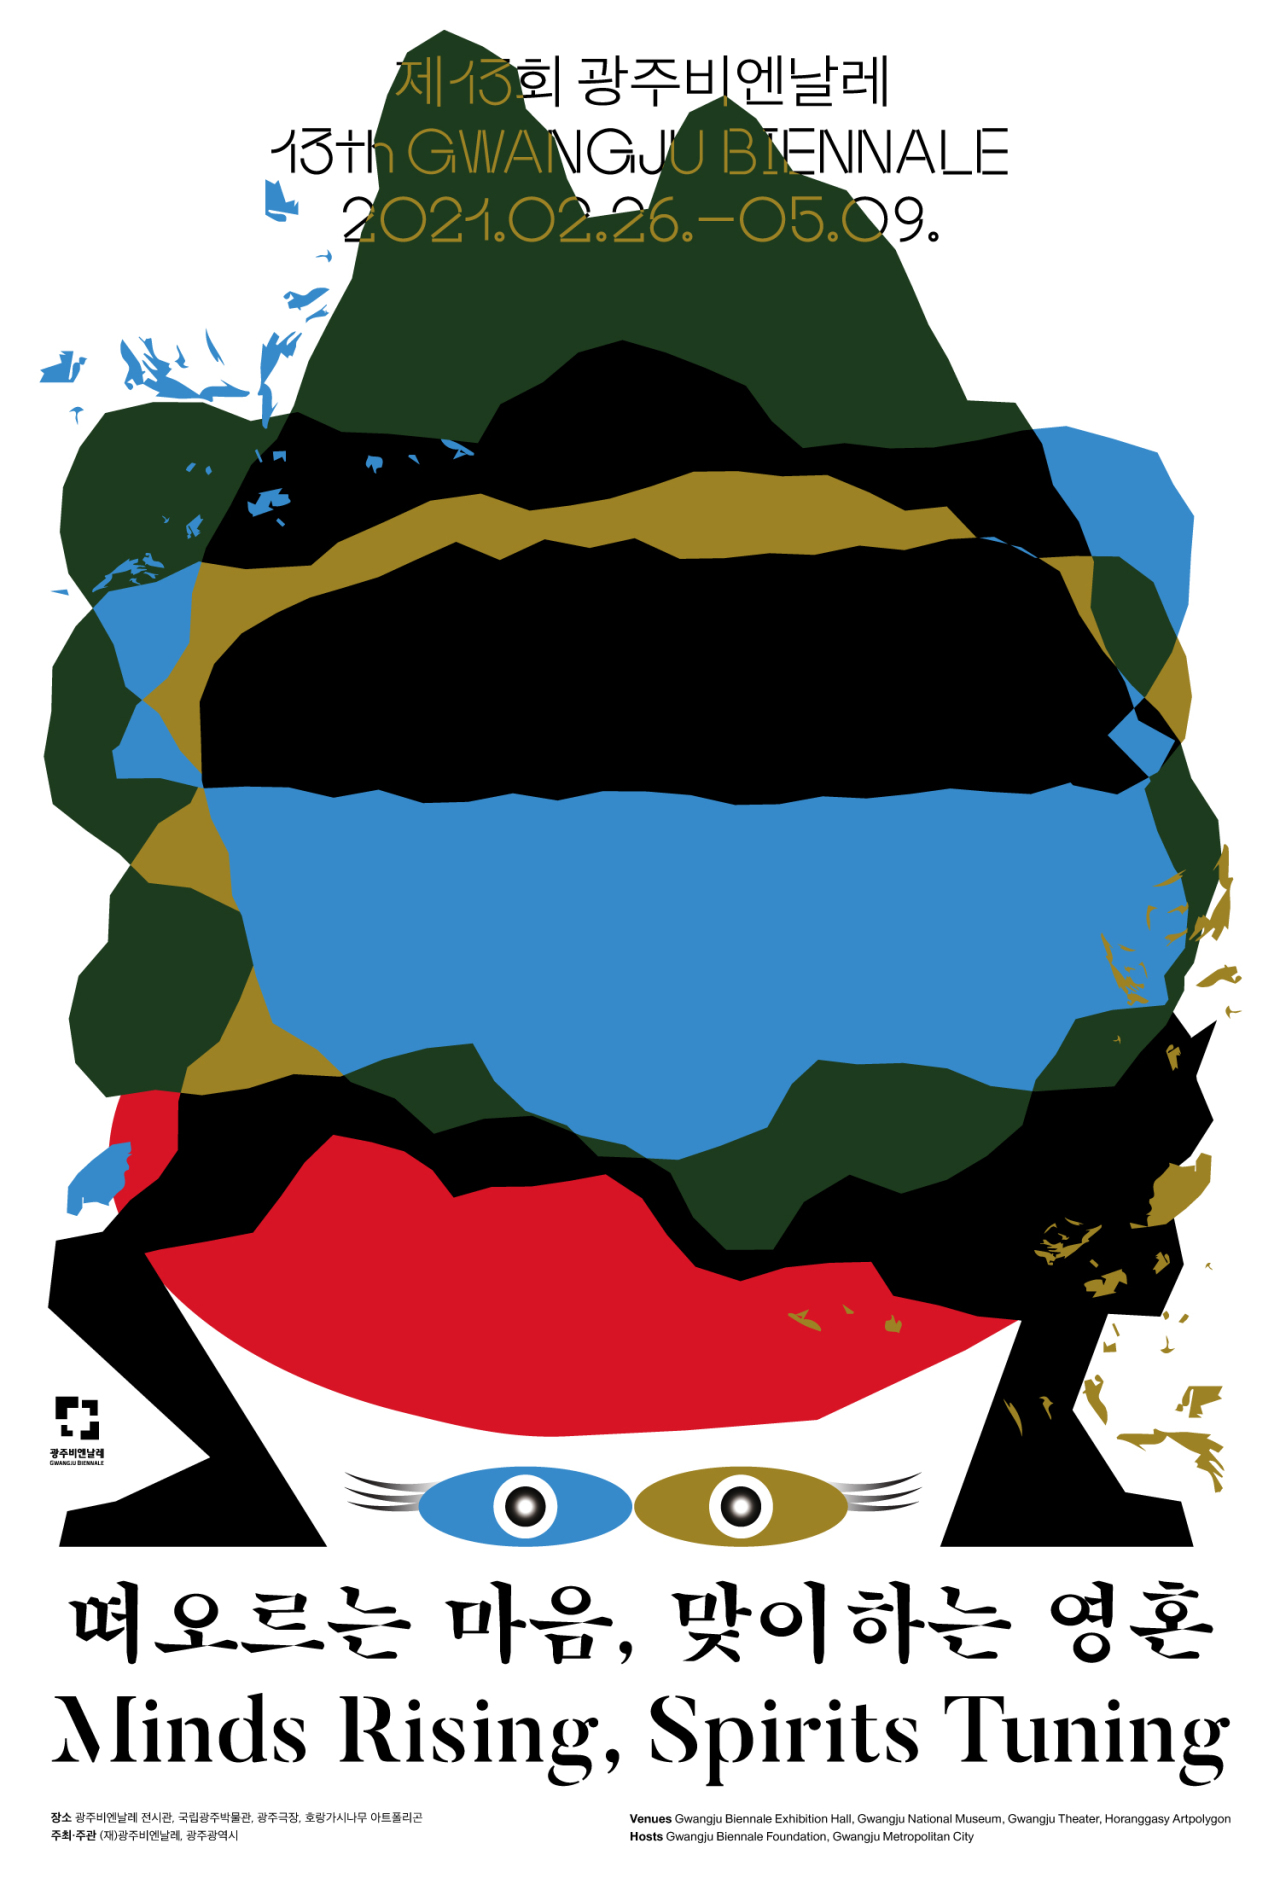 Official poster of the 13th Gwangju Biennale (Gwangju Biennale Foundation)